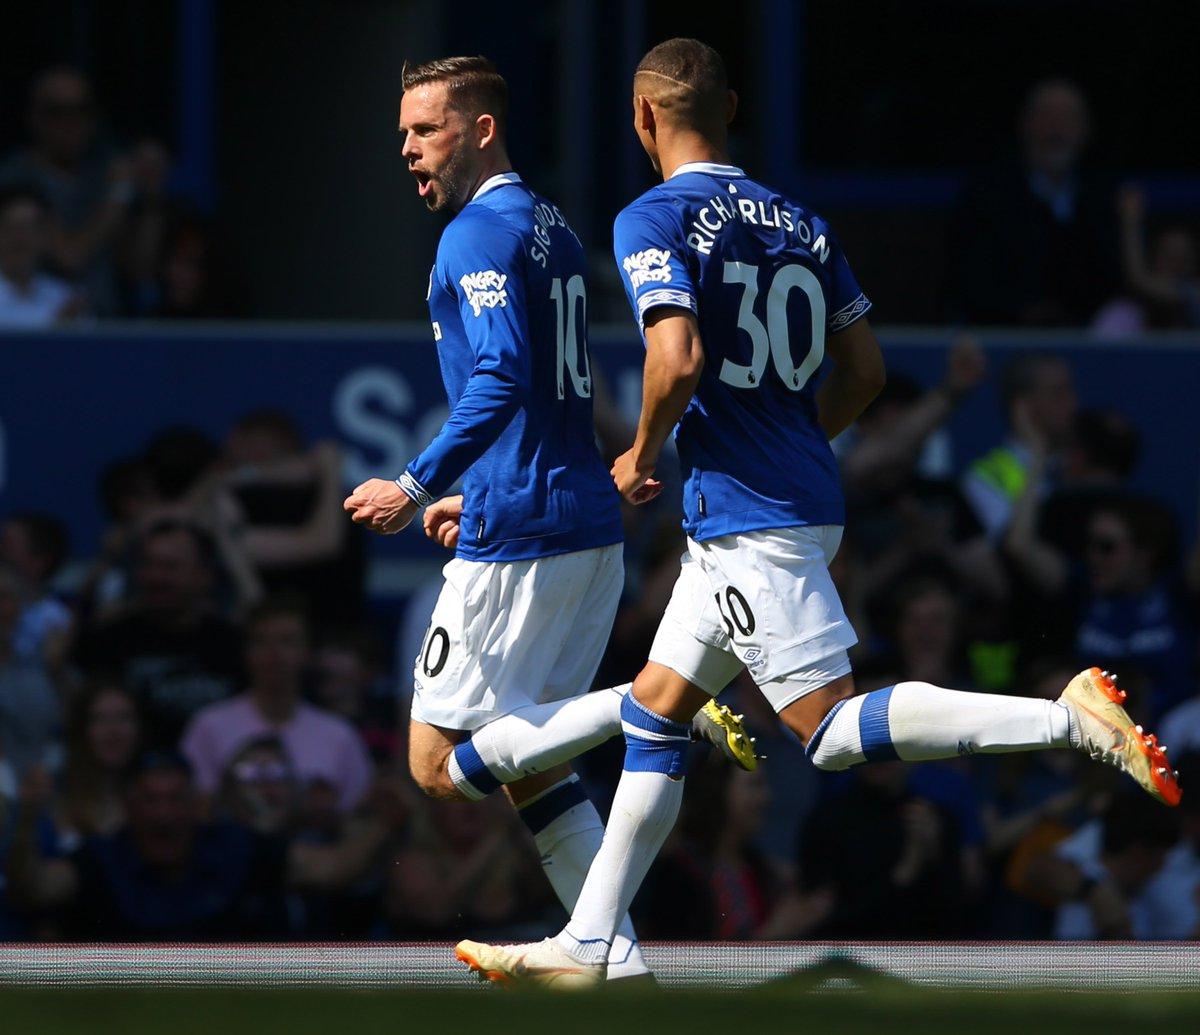 Selebrasi pemain Everton Gylfi Sigurdsson (depan) usai membobol gawang David de Gea.